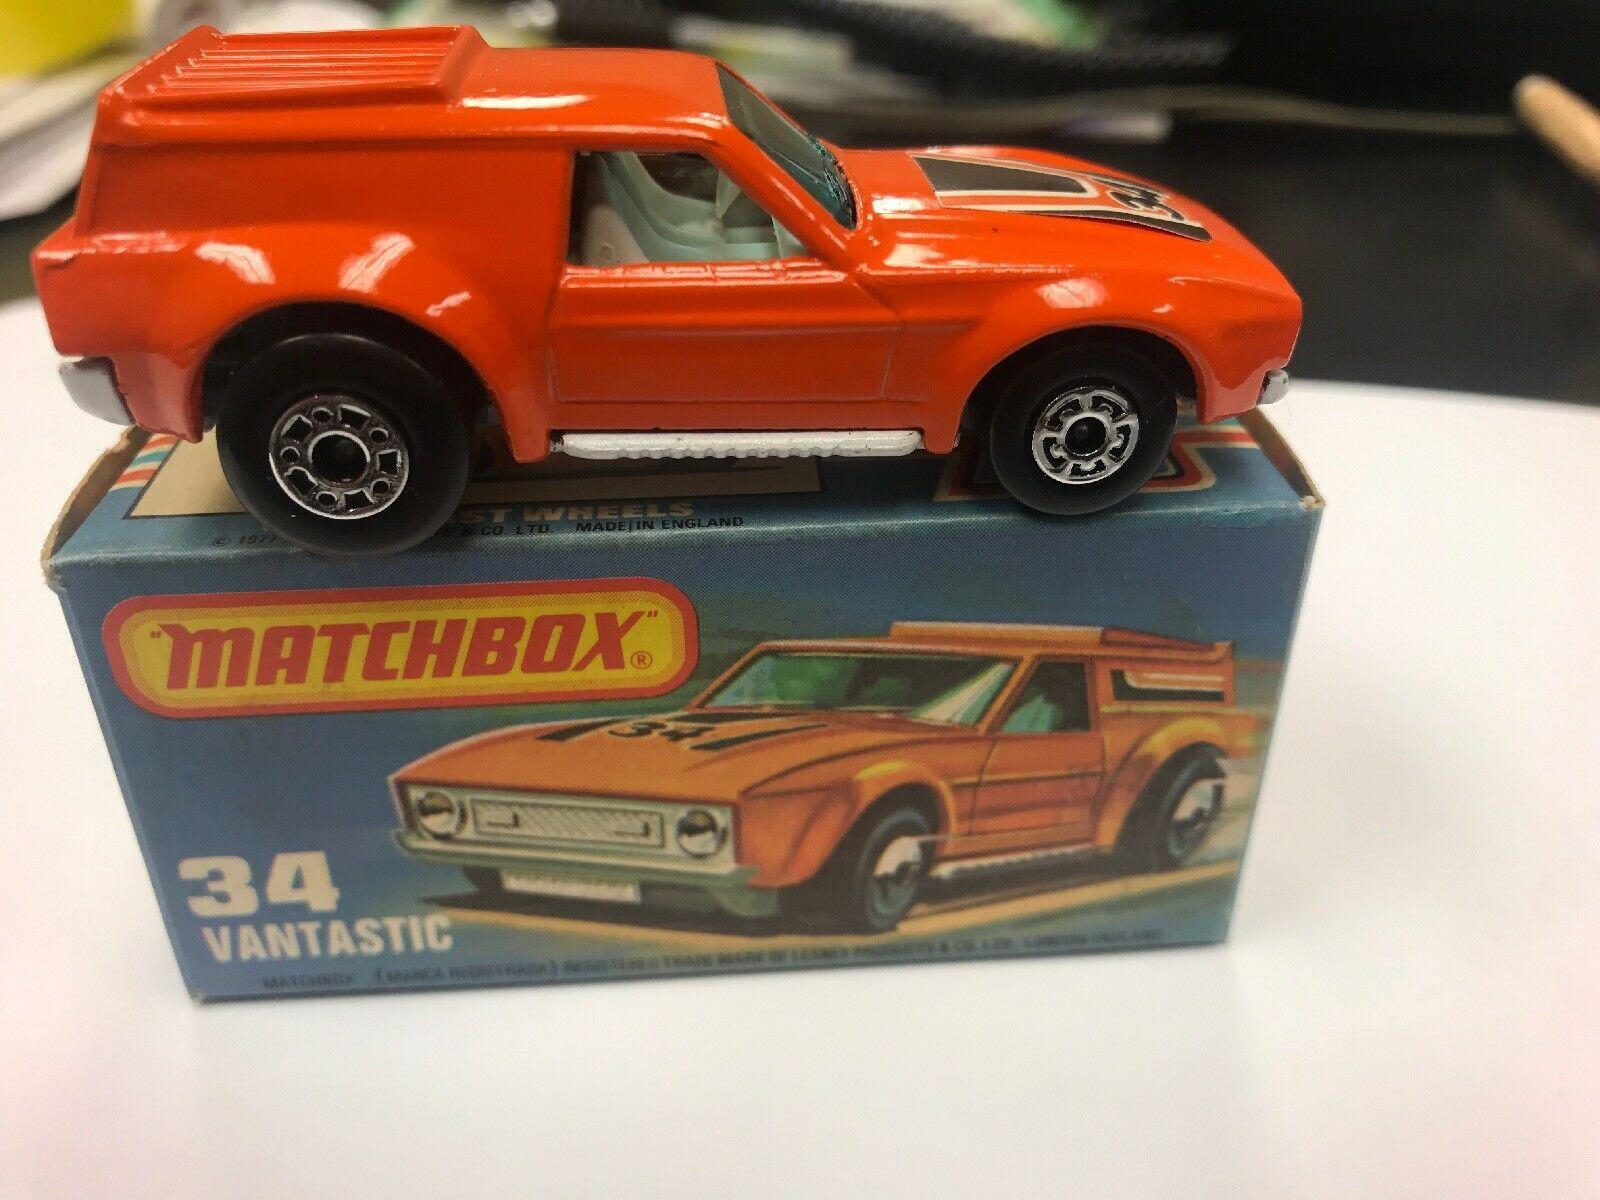 MATCHBOX LESNEY SUPERFAST 1975 34 VANTASTIC MADE IN